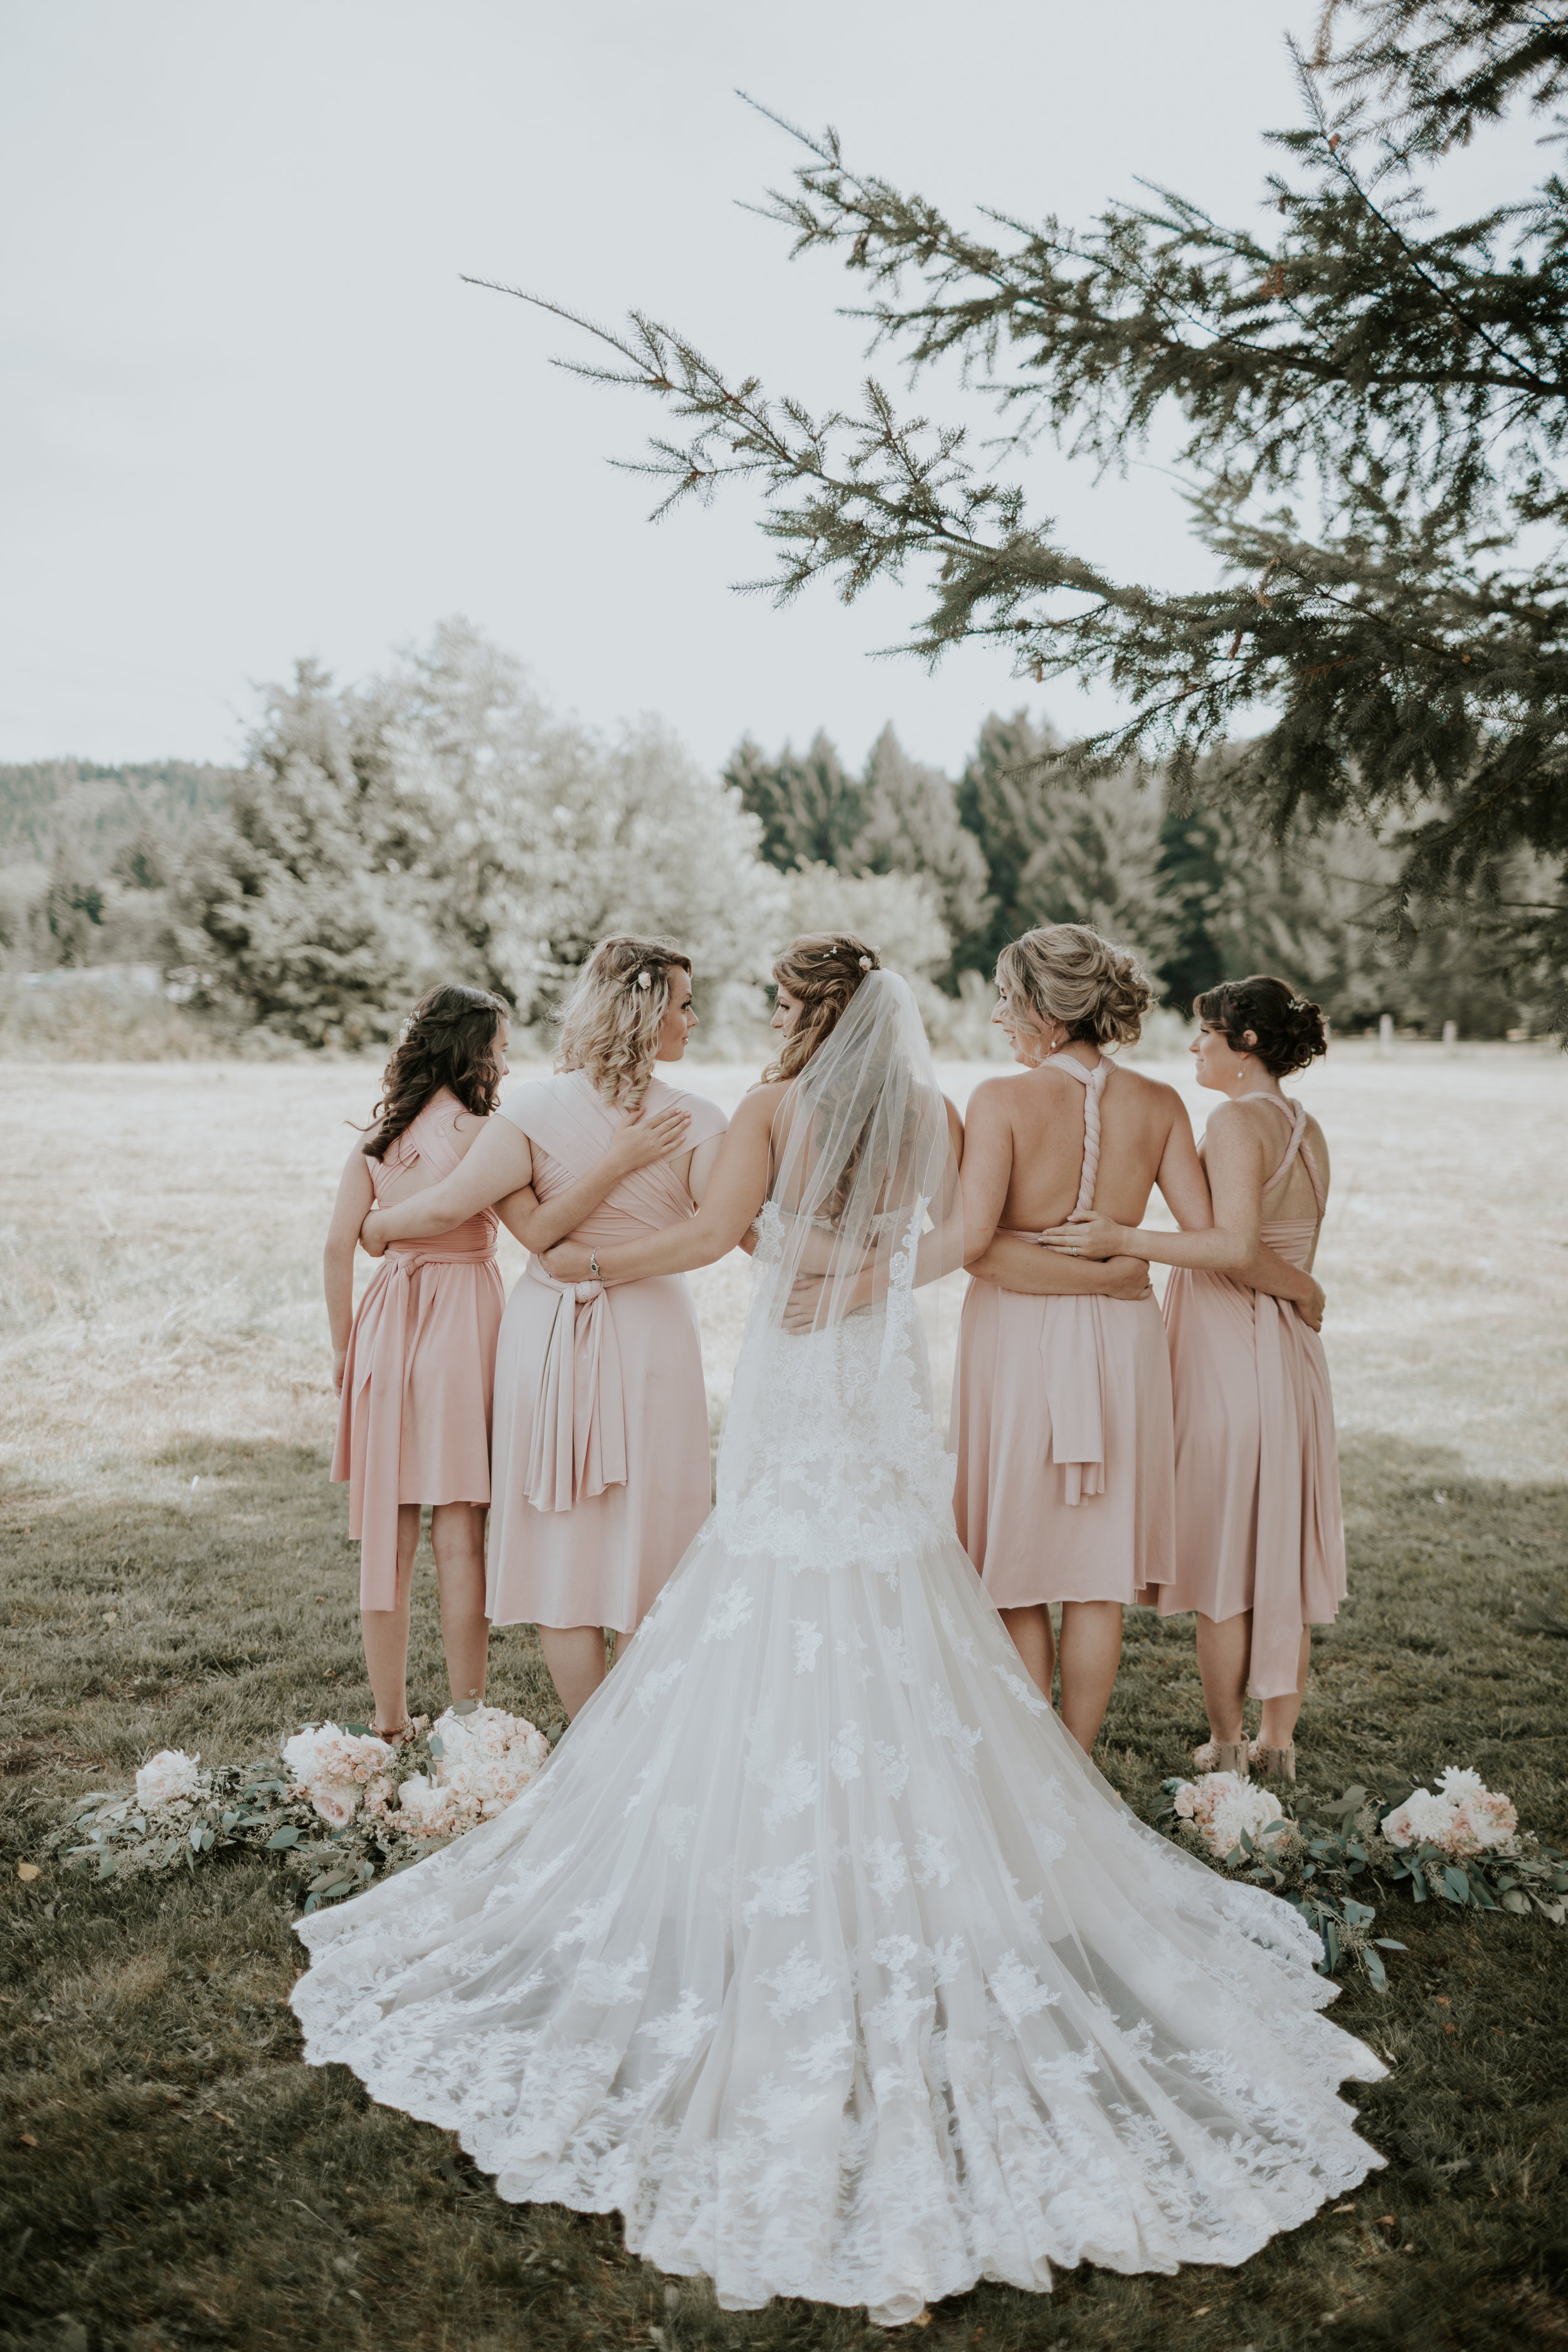 Olympic-Peninsula-Wedding-Photographer-PNW-Forks-Port-Angeles-Kayla-Dawn-Photography-engagement-Olympic-National-Park-25.jpg